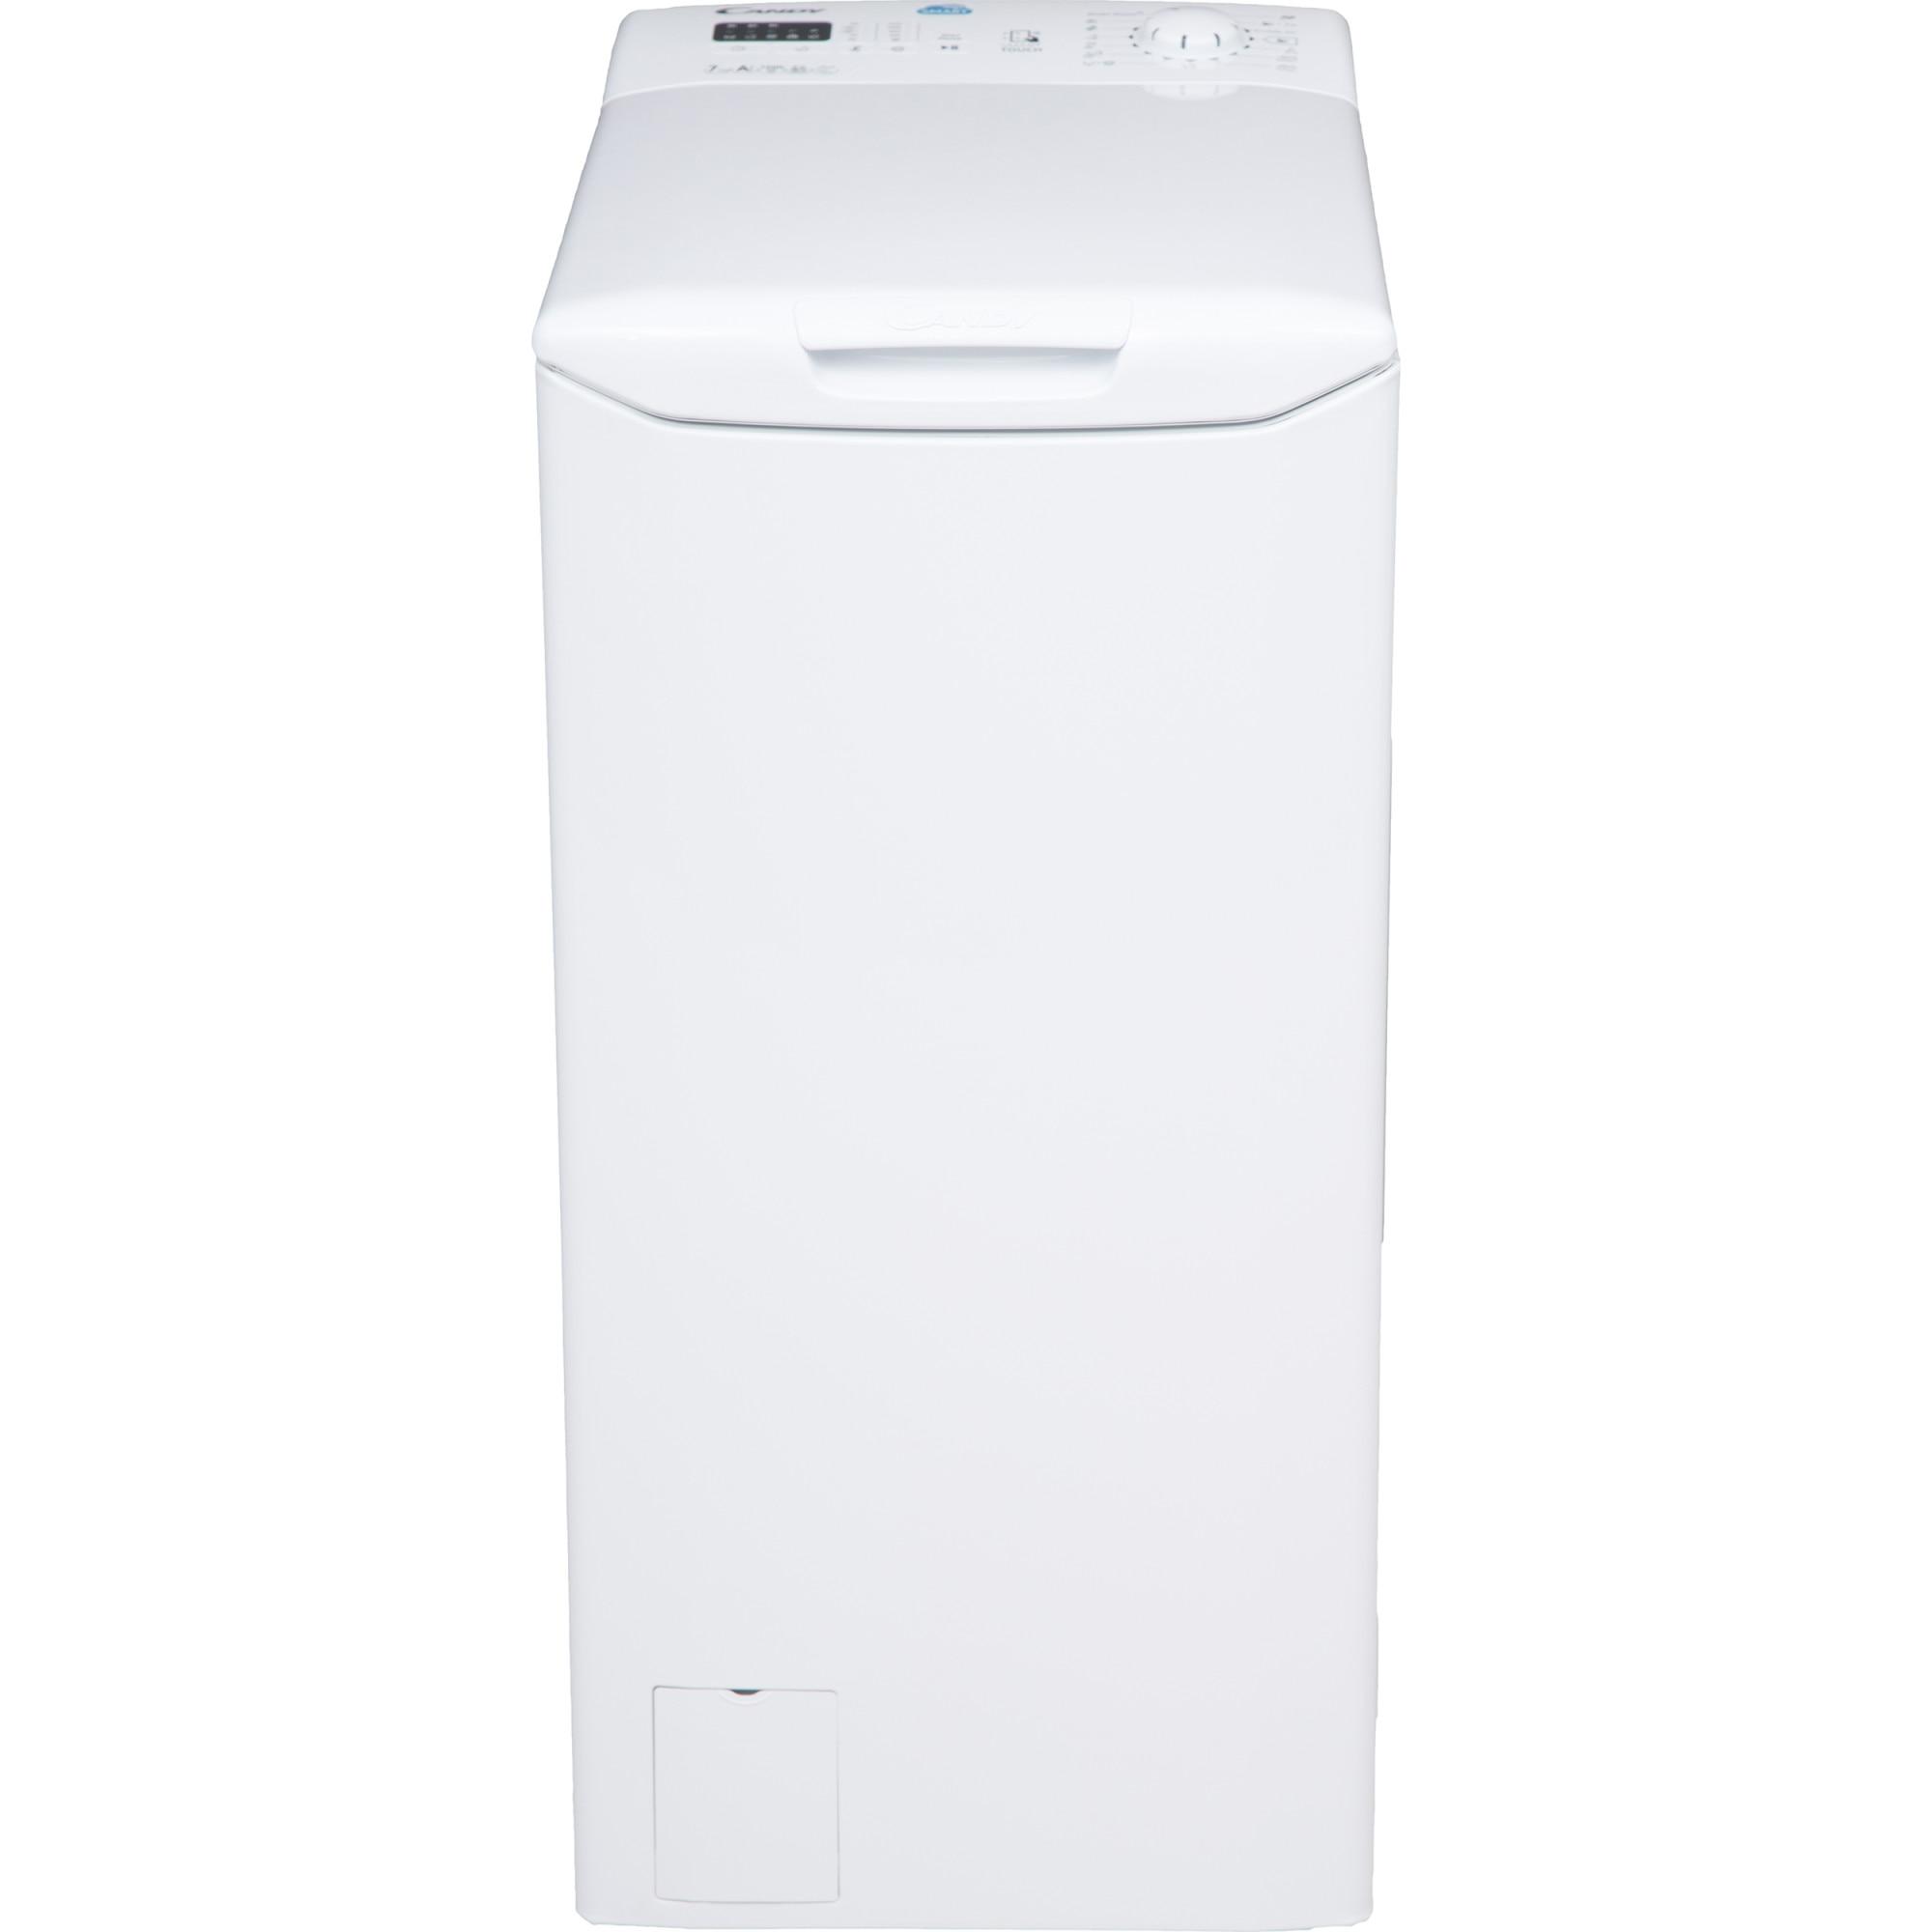 Fotografie Masina de spalat rufe cu incarcare verticala Candy CST 372L-S, Afisaj LED, Smart Touch, NFC, 7 kg, 1200 RPM, Clasa A+++, Alb